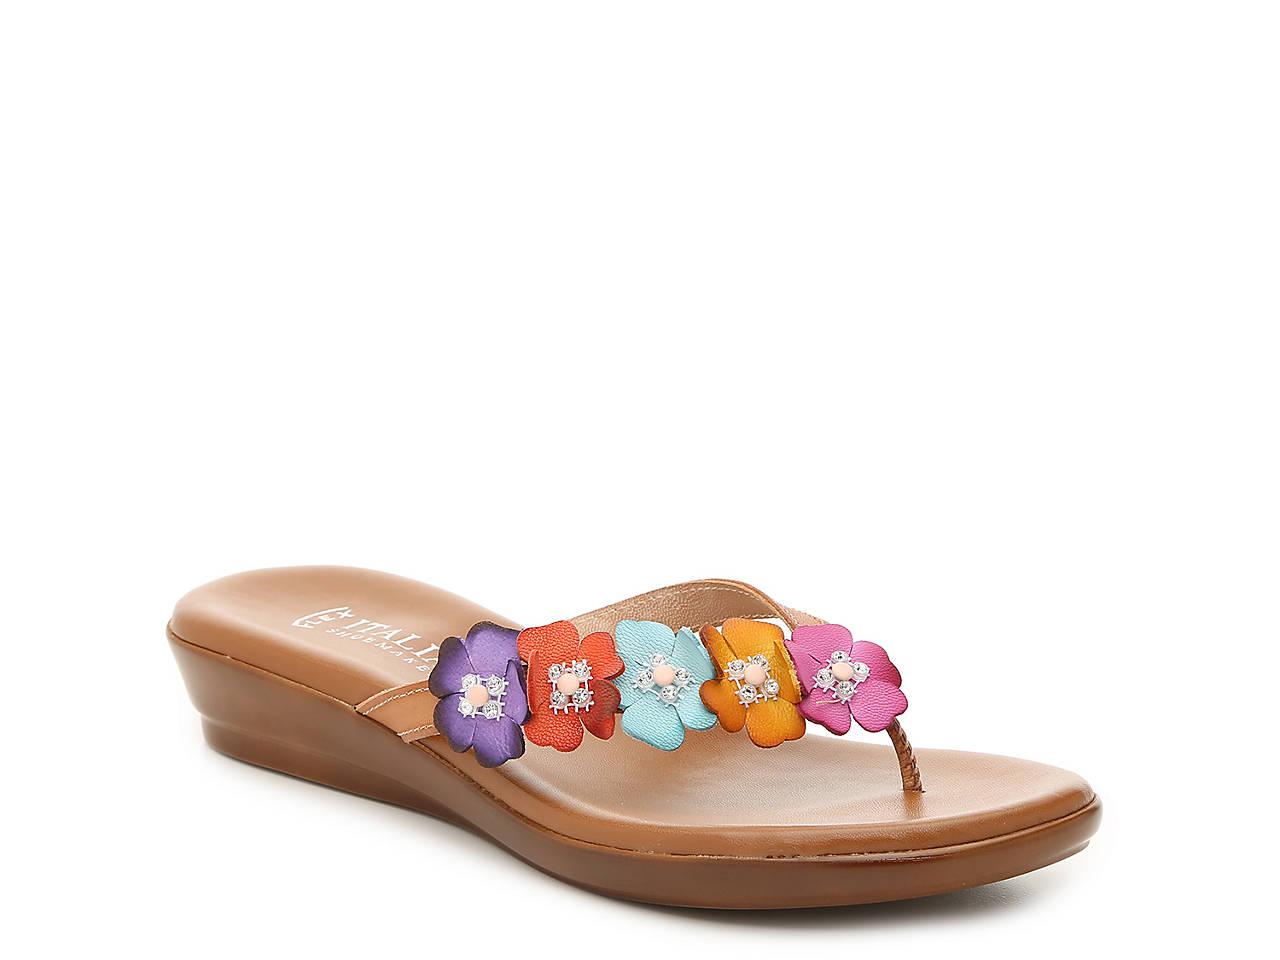 Italian Shoemakers Emina 9f6R96